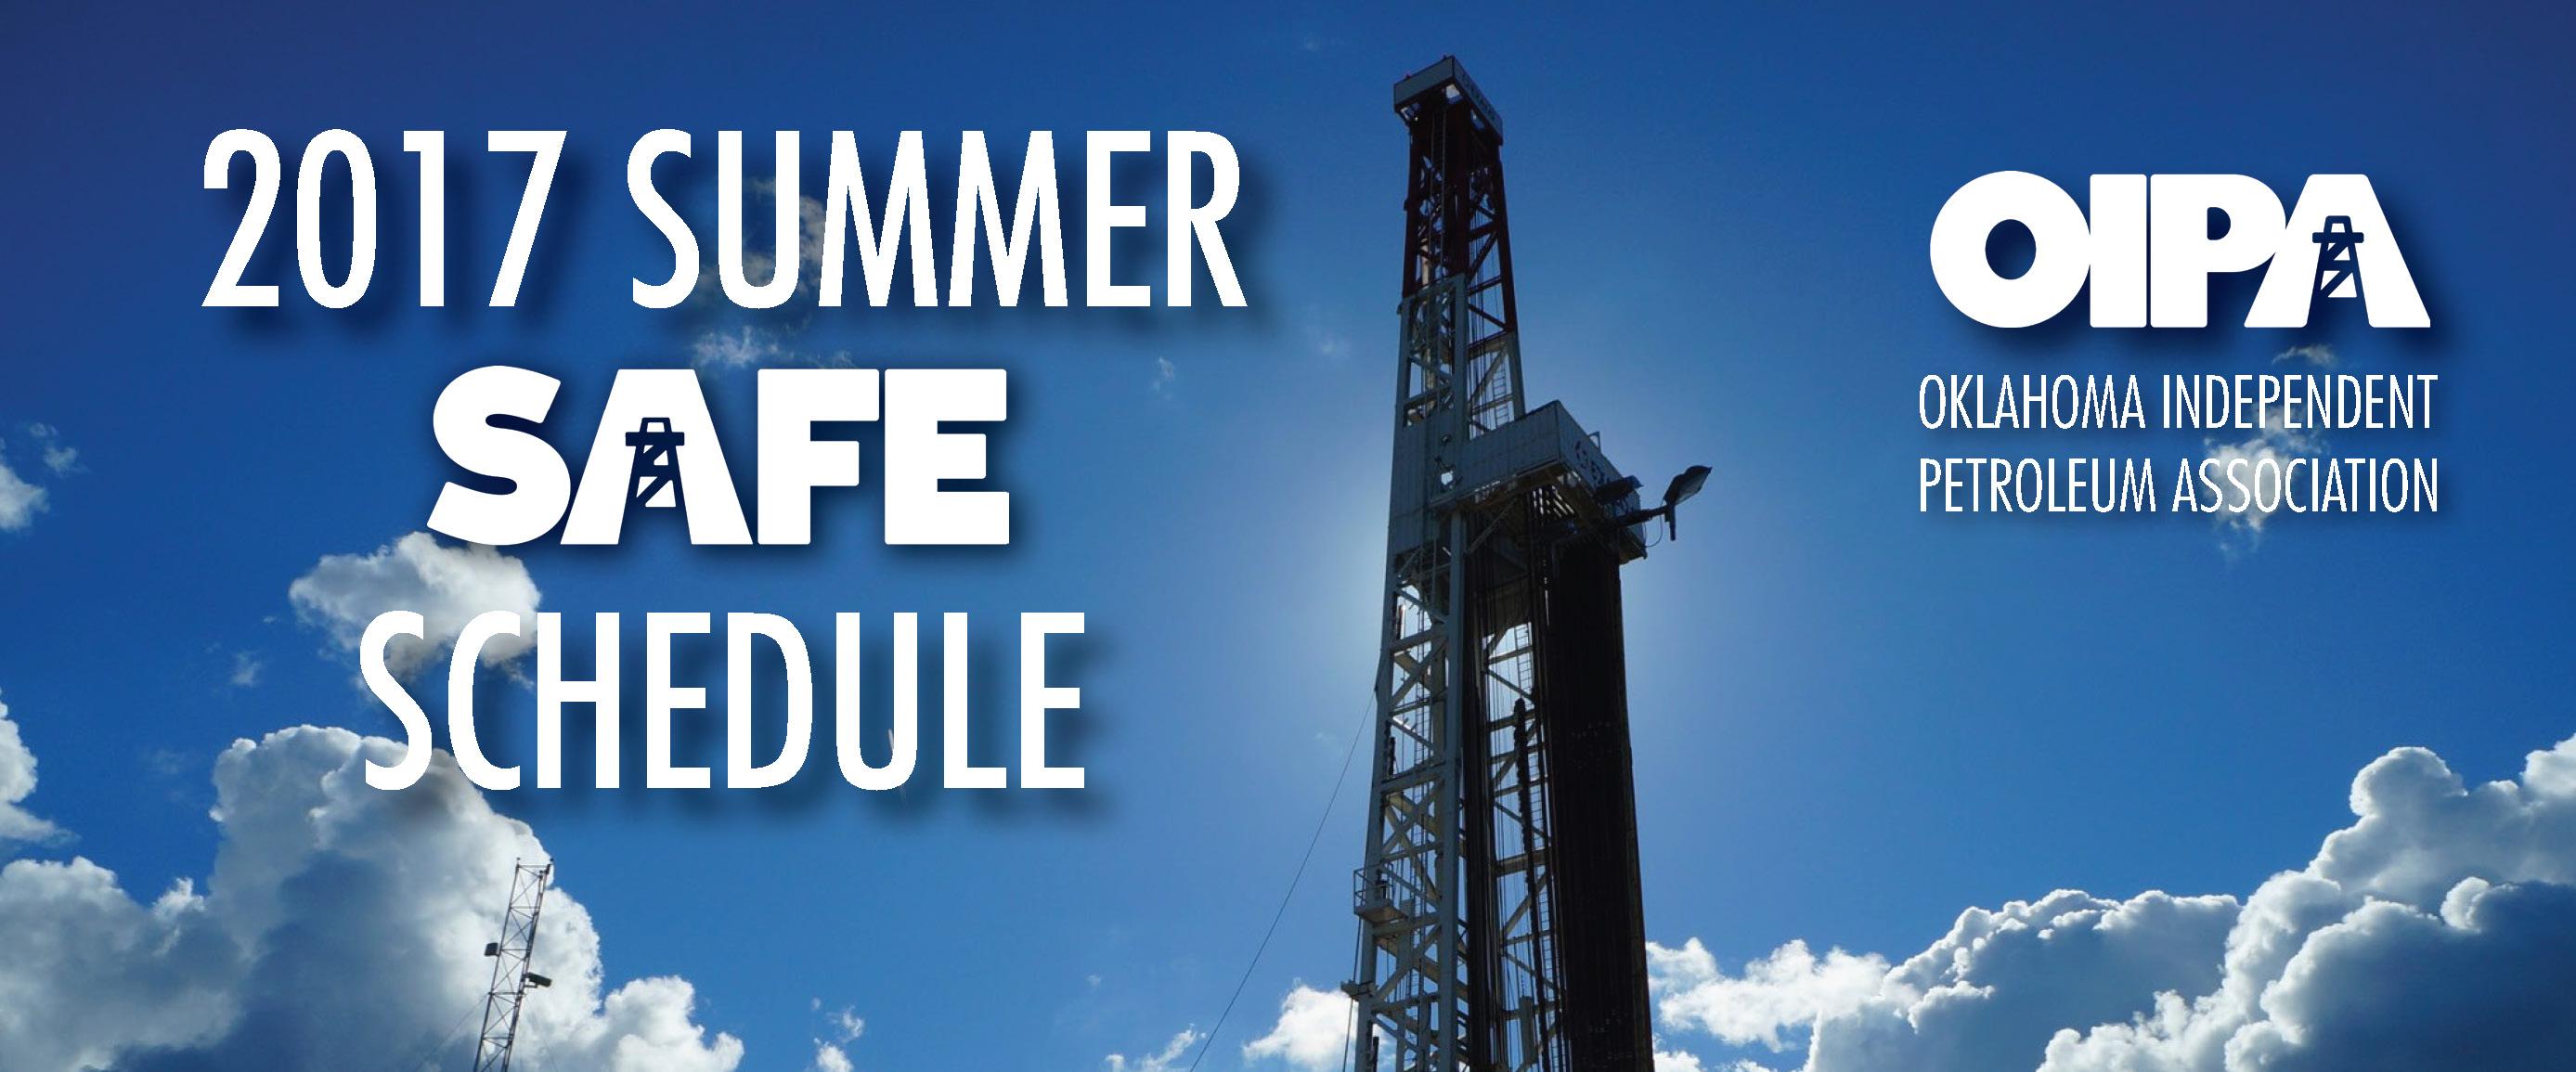 OIPA Summer 2017 SAFE Schedule